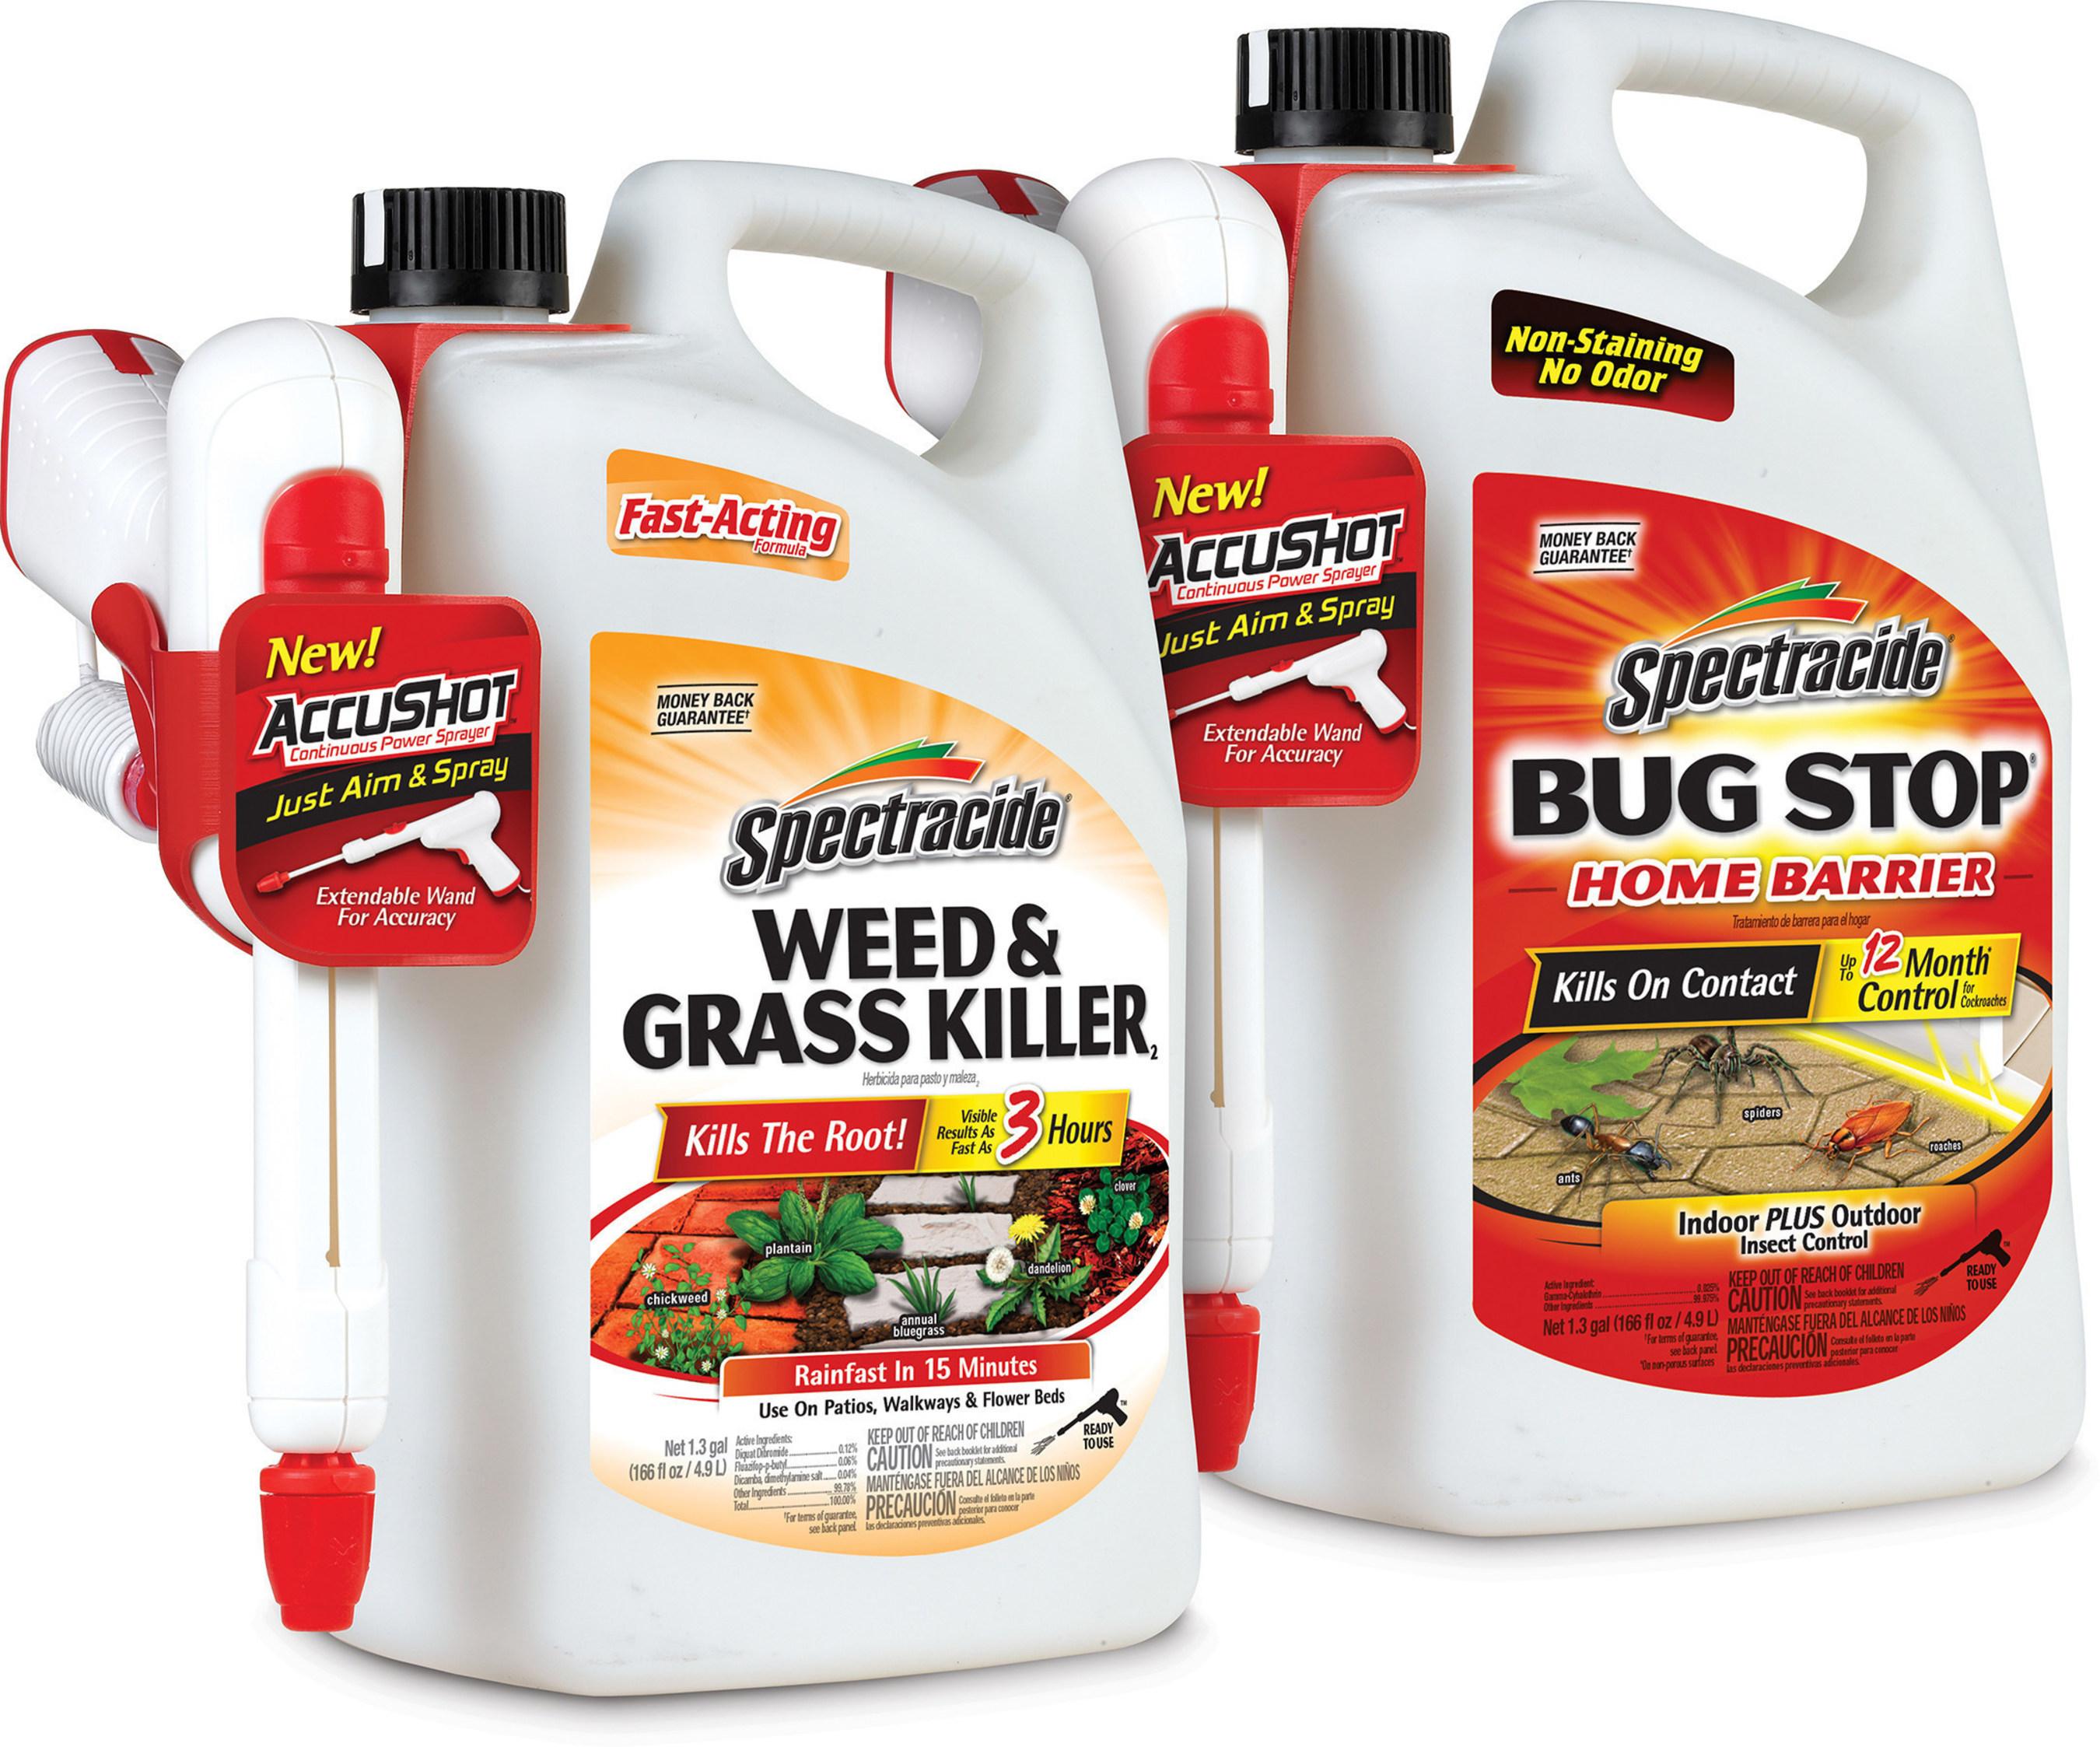 Spectracide Weed & Grass Killer AccuShot Sprayer and Spectracide Bug Stop Home Barrier AccuShot Sprayer.